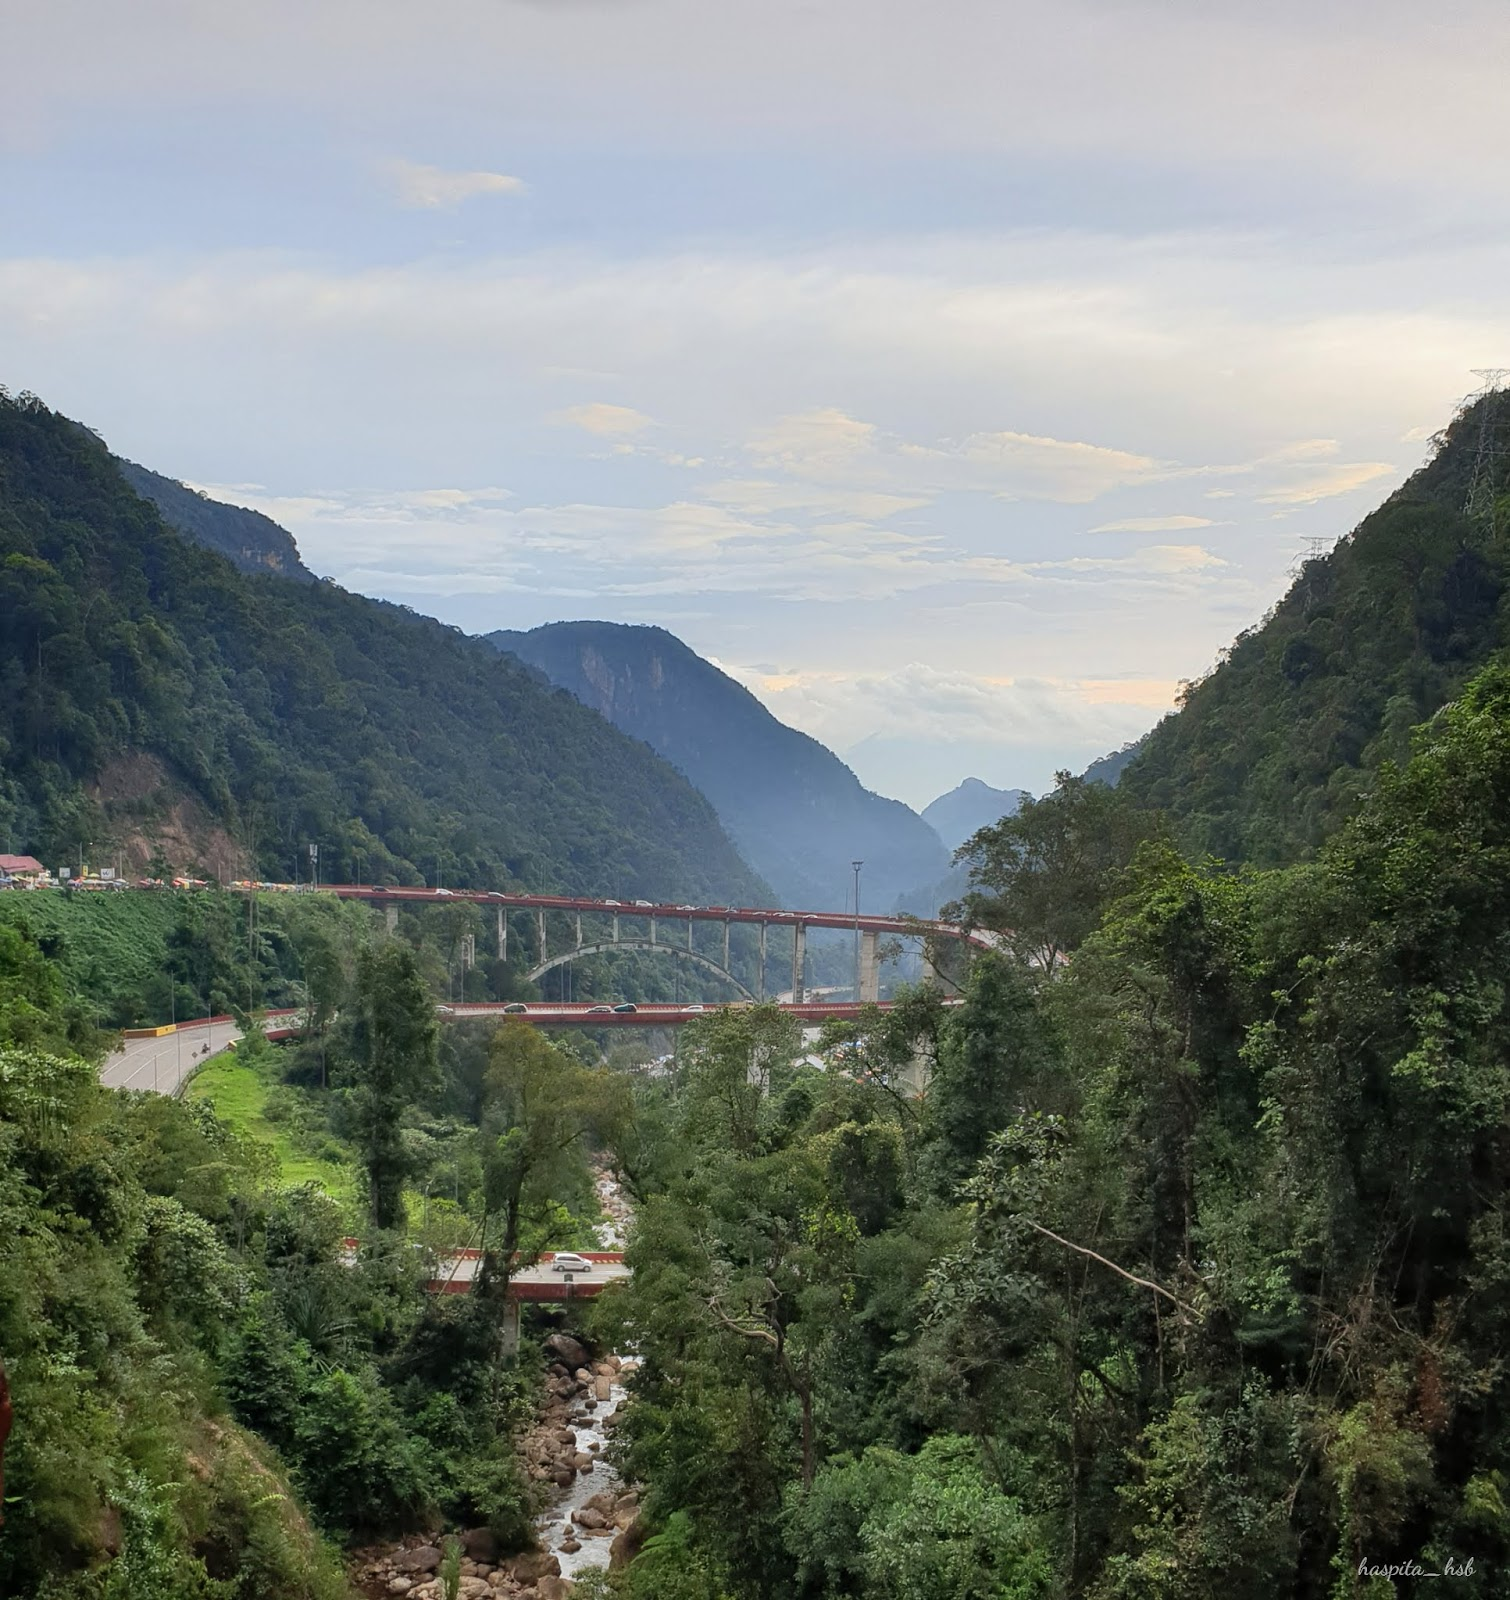 Daerah Payakumbuh merupakan dataran yang masih didominasi oleh pegunungan